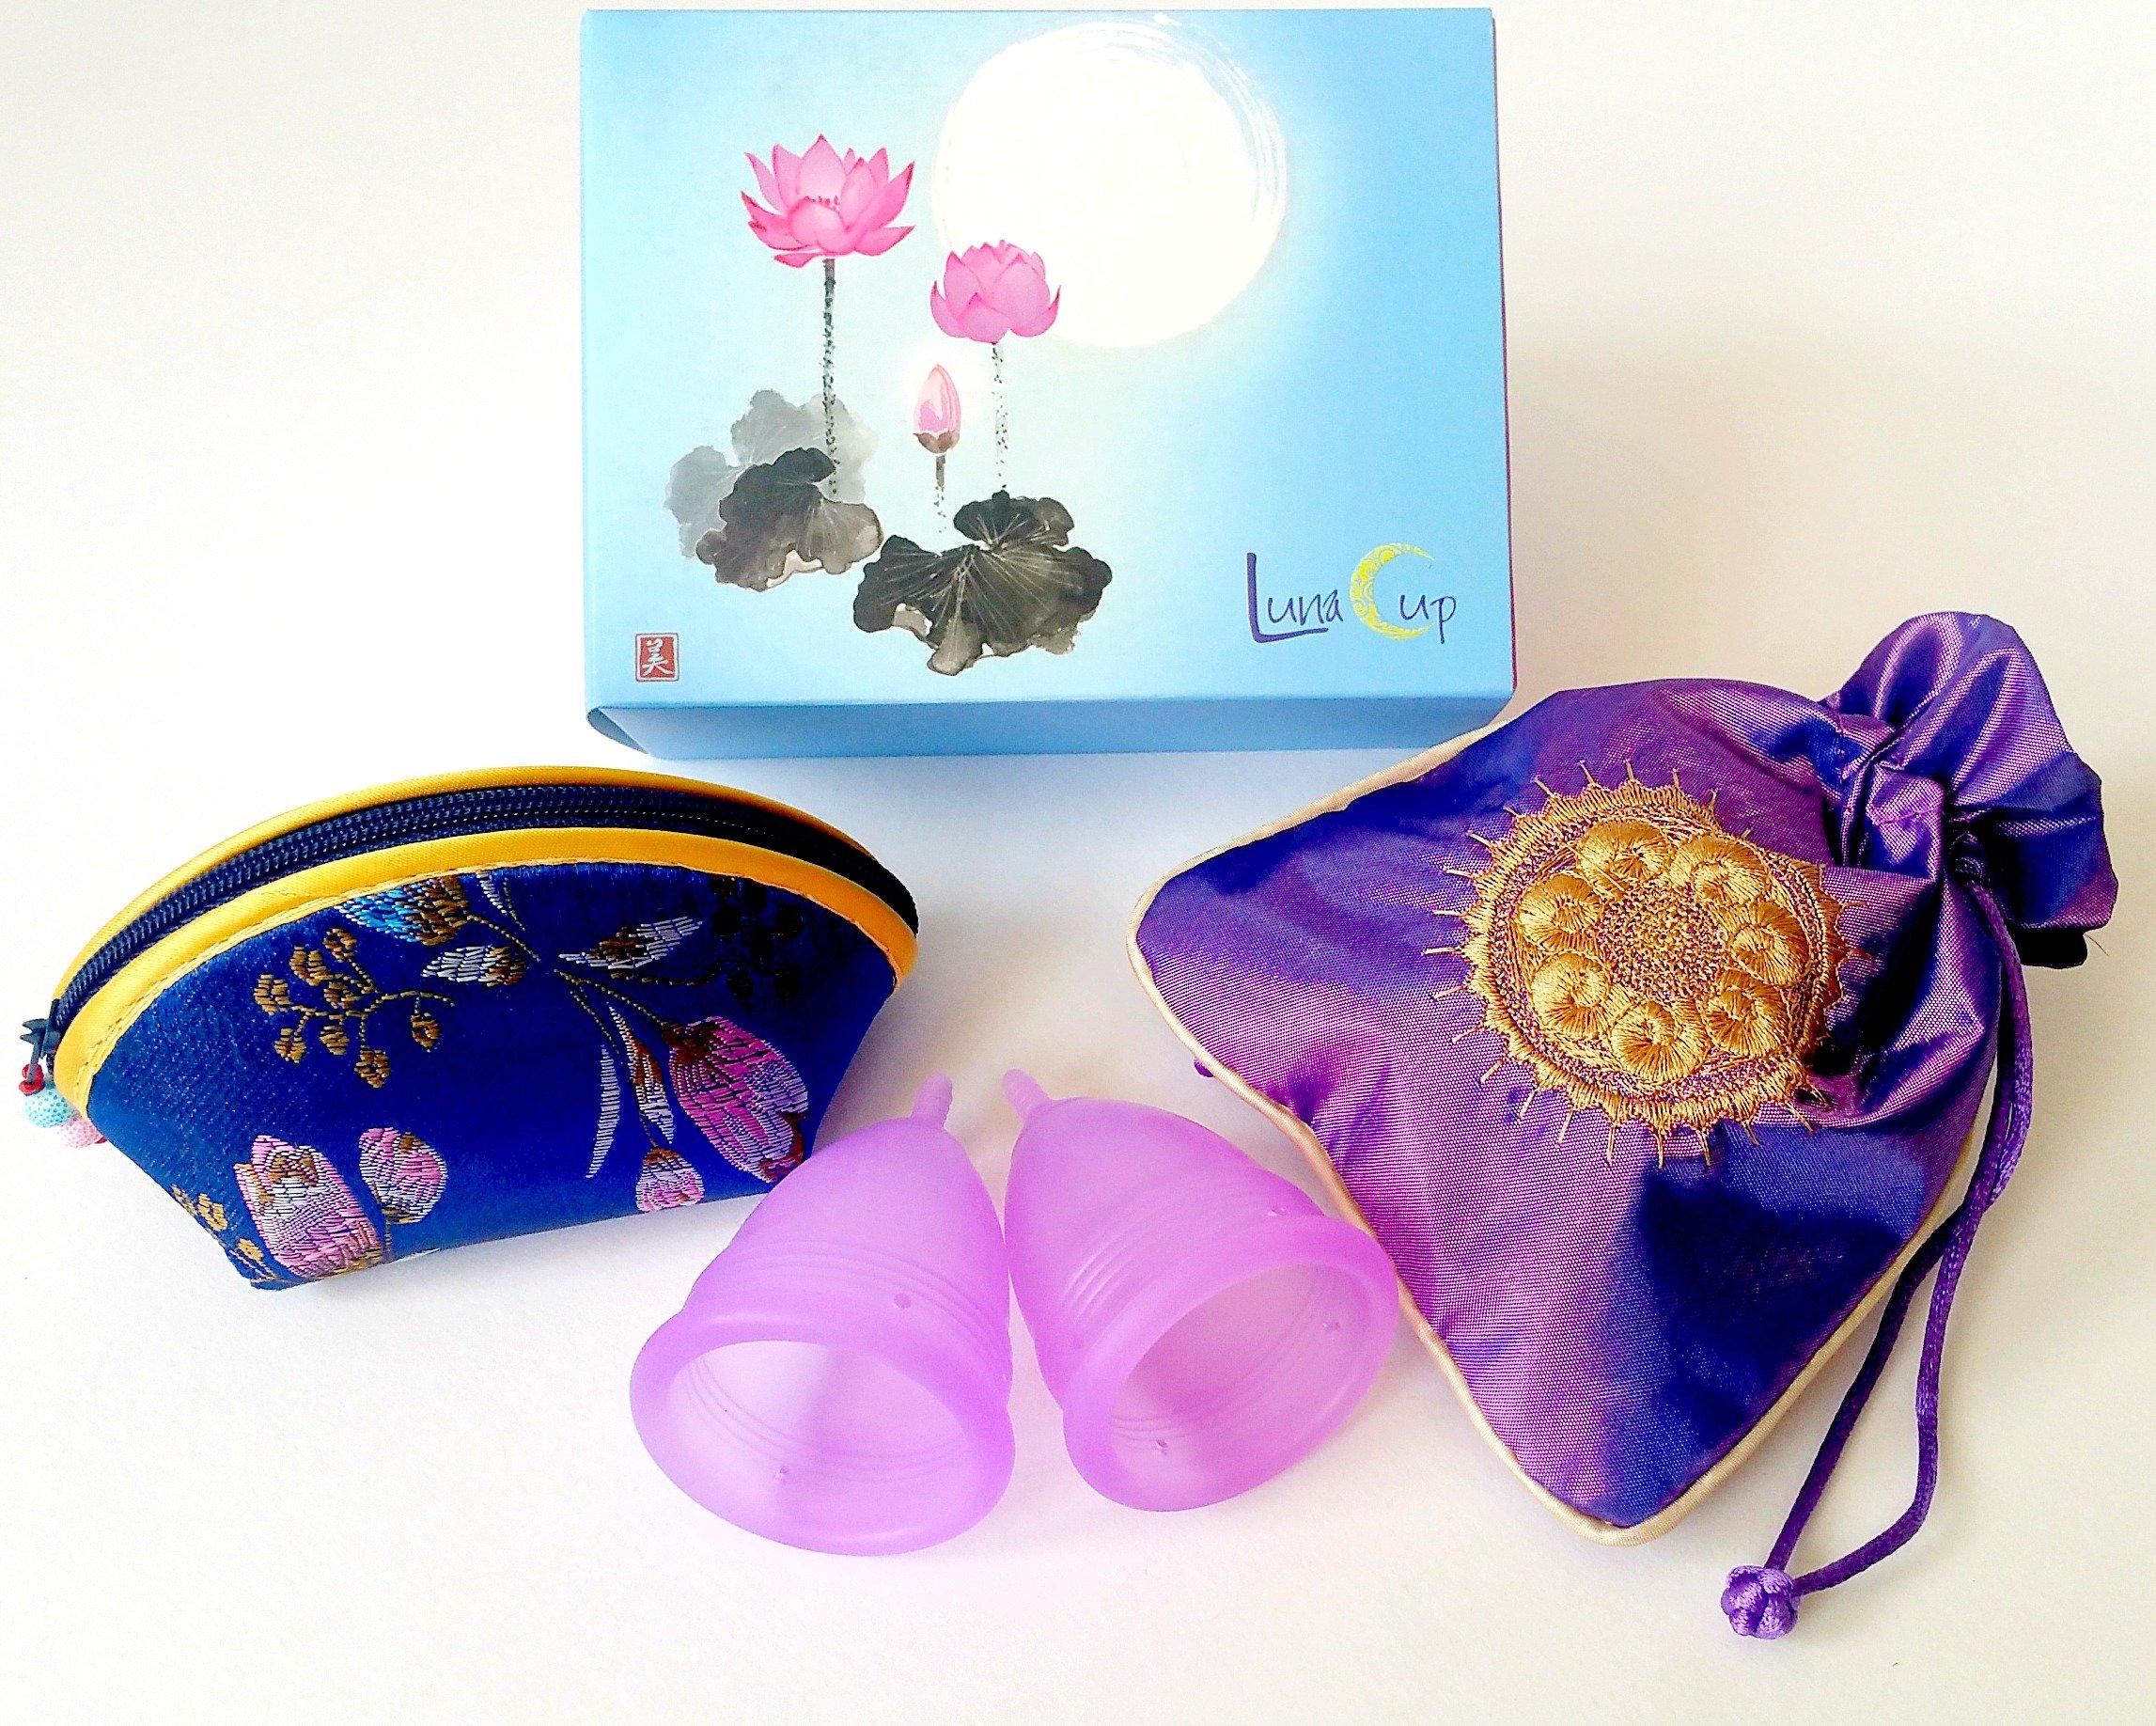 Luna Cup Menstruation Kit (2 L Cups)